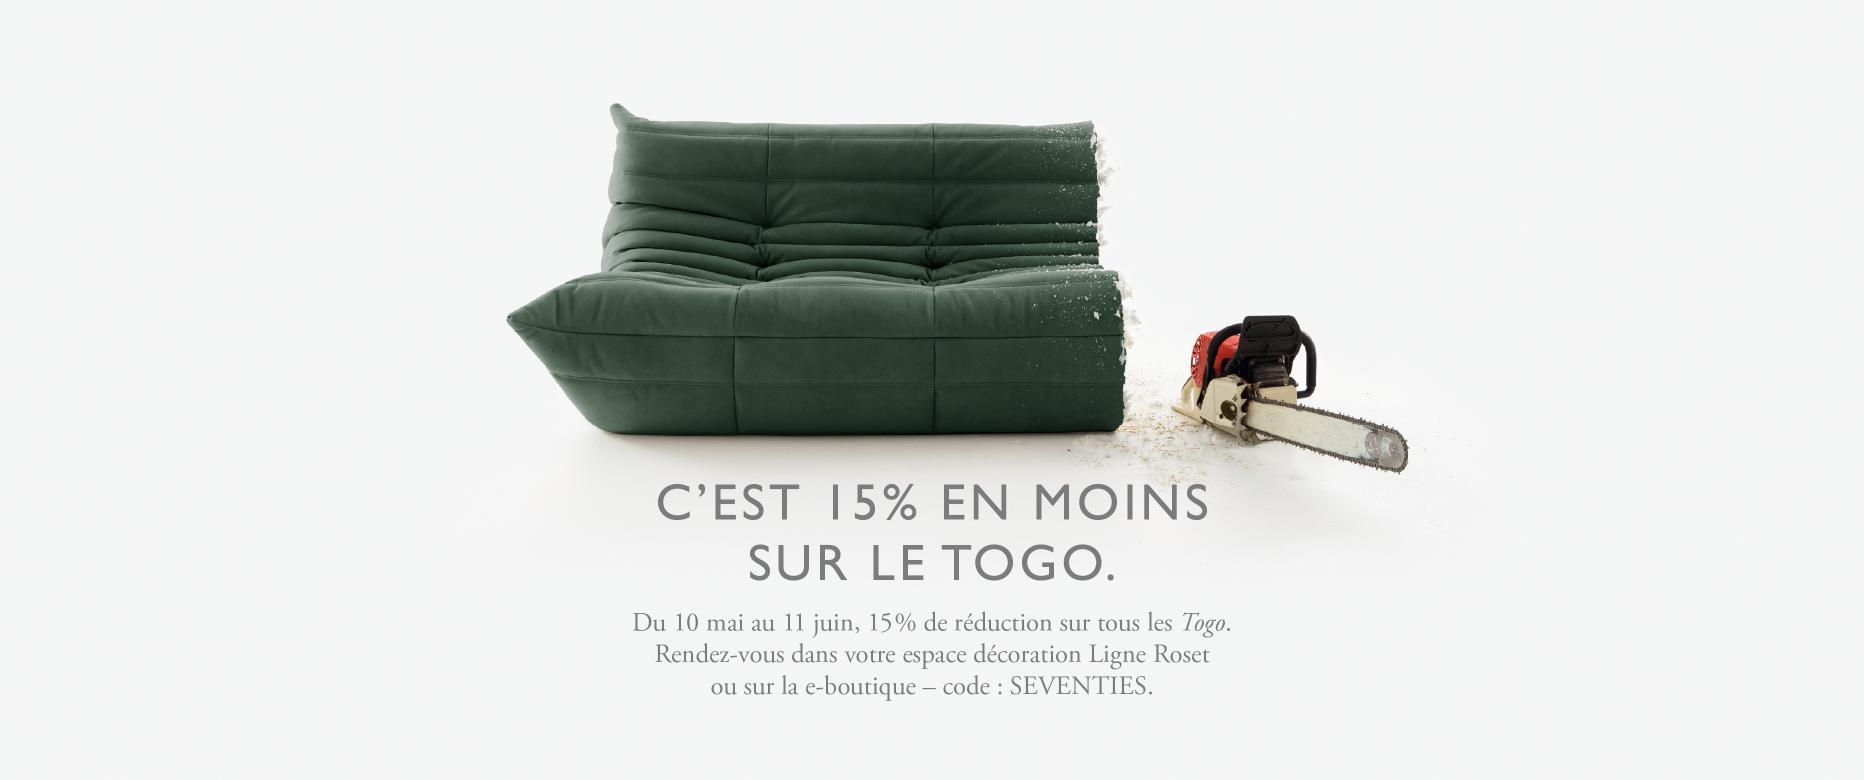 Togo 2019 Ligne Roset